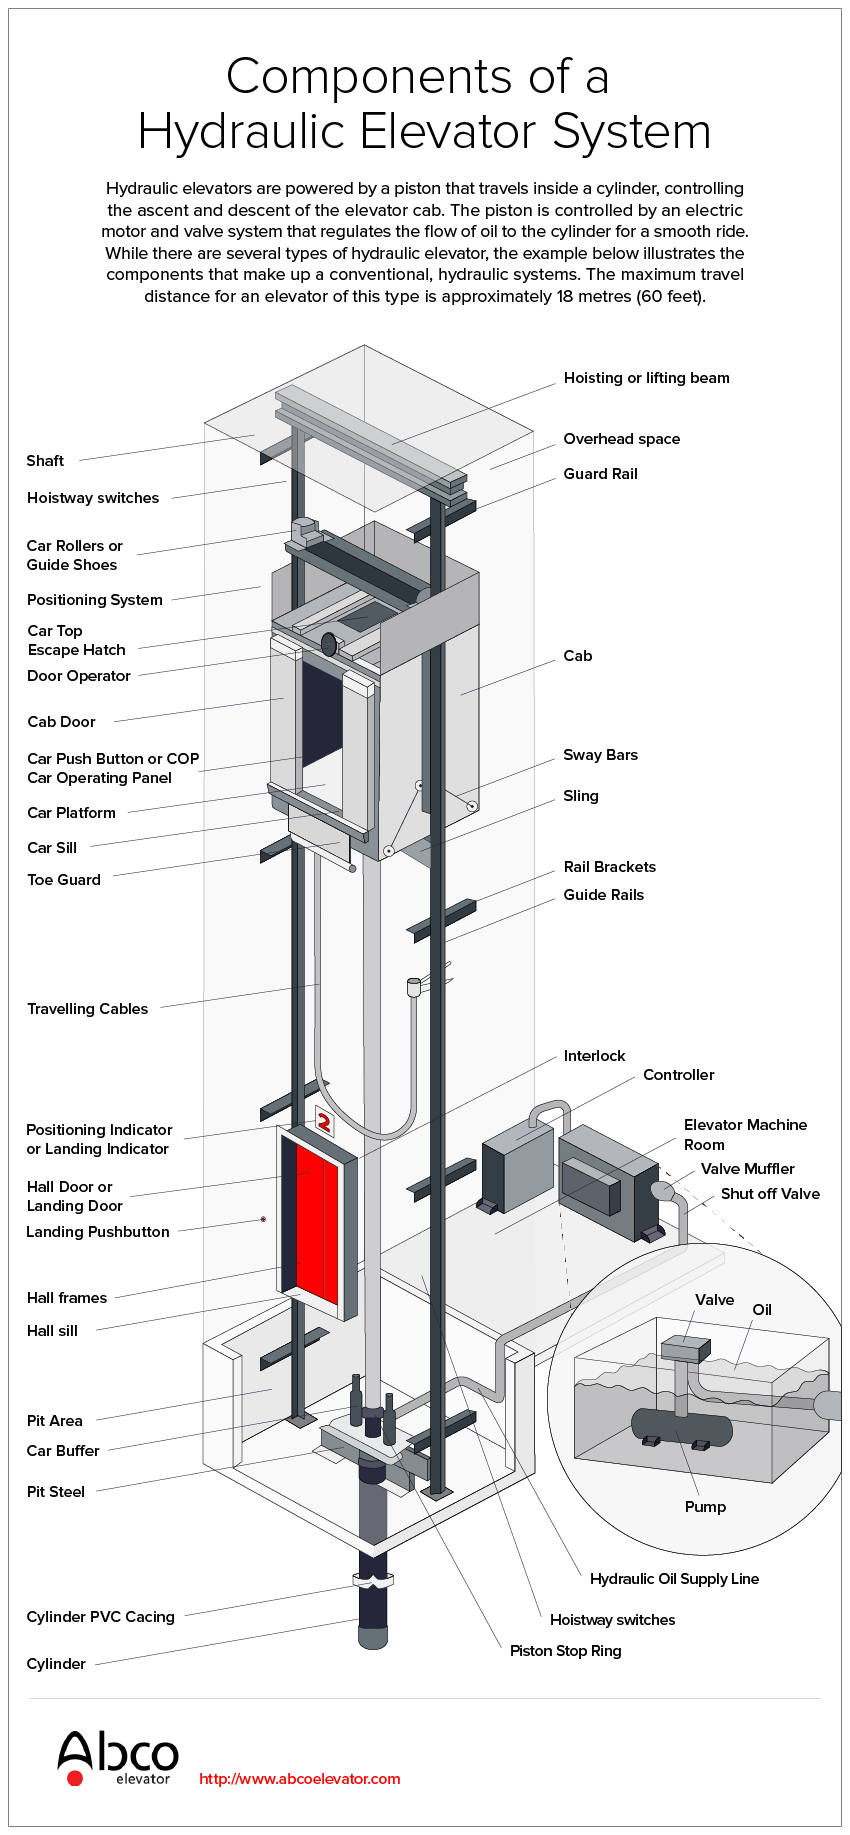 Elevator Installation Manual : Hydraulic elevators abco elevator